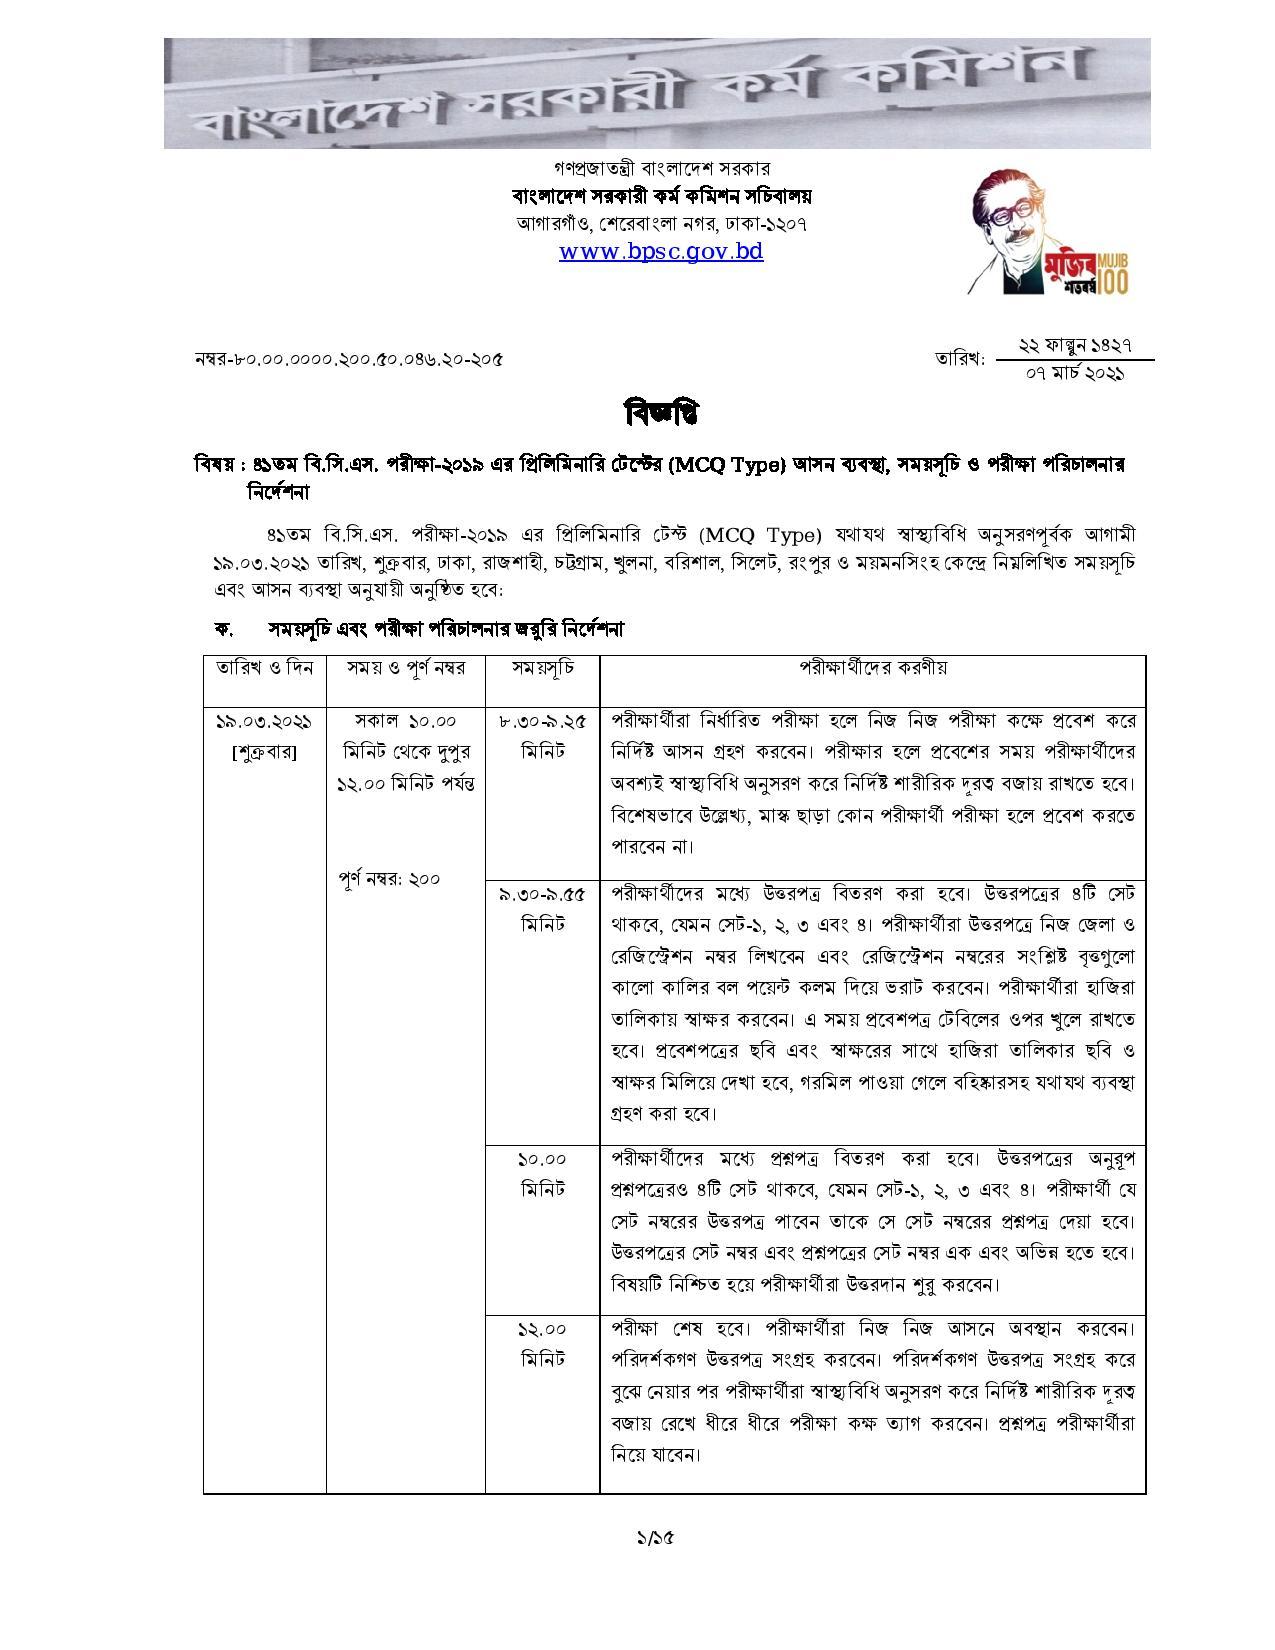 41th bcs exam routine